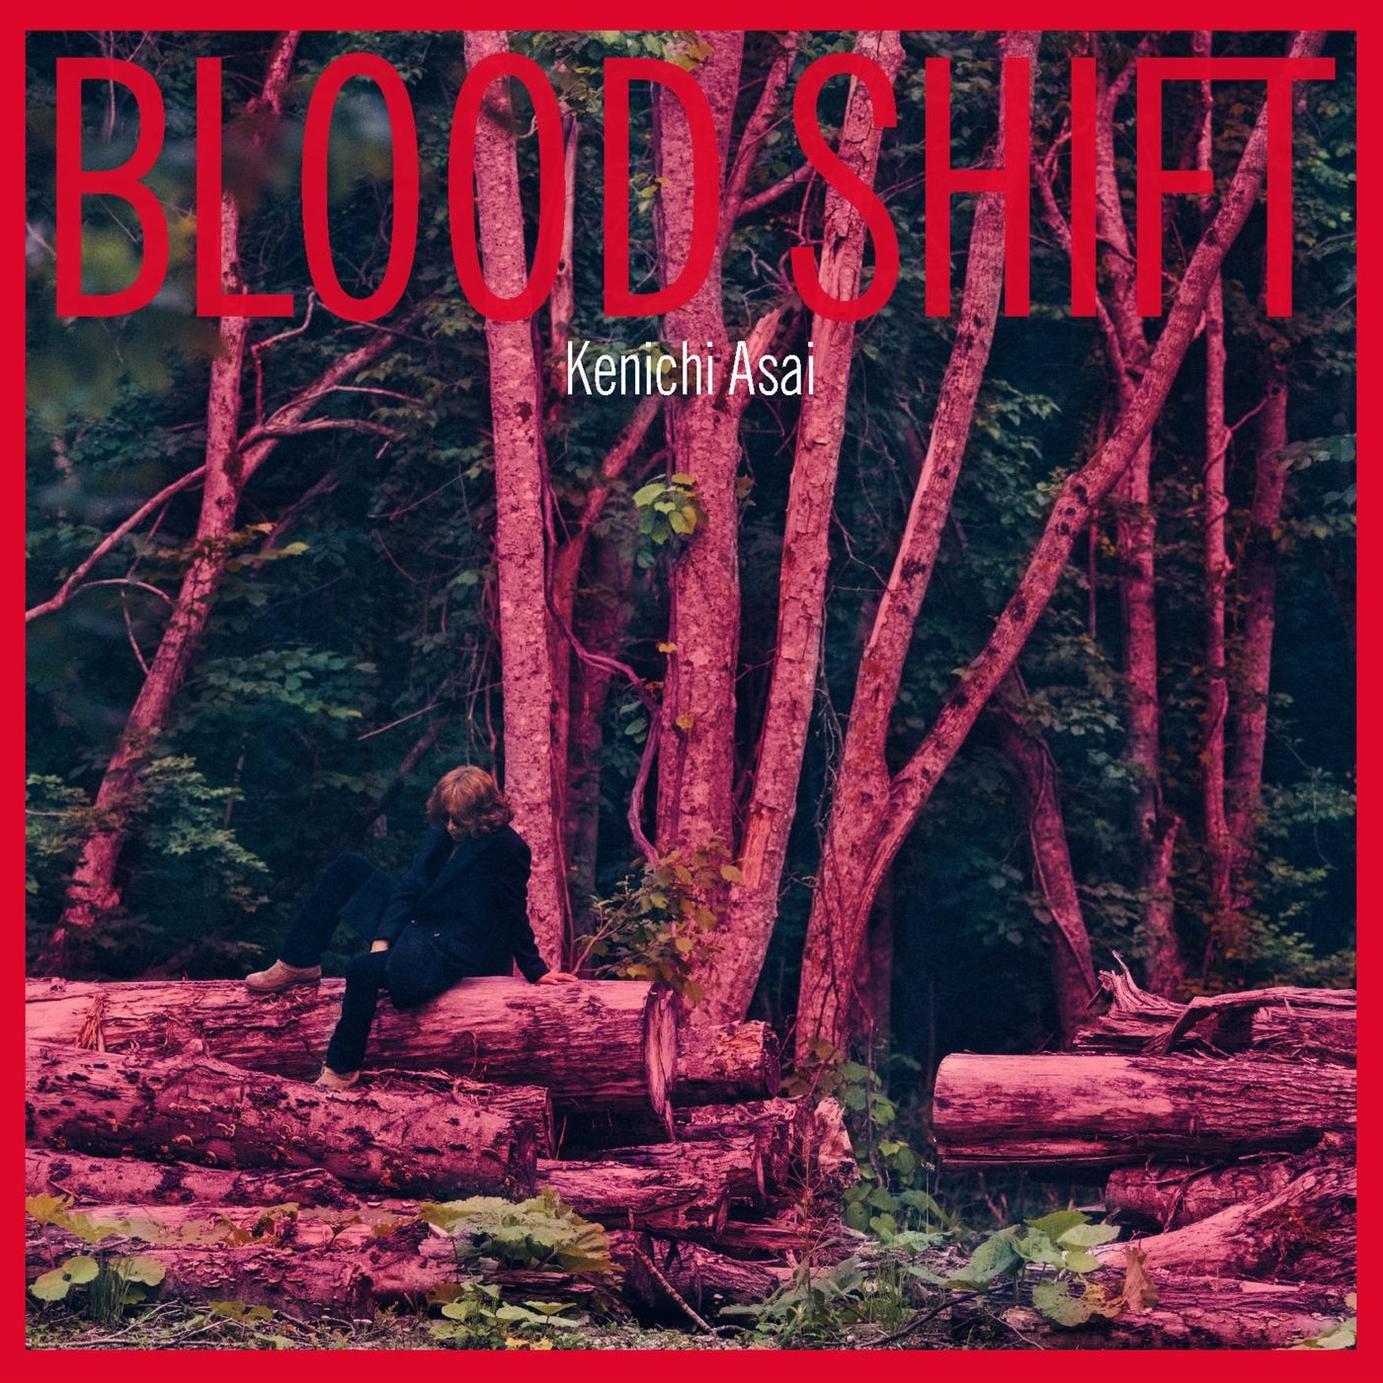 浅井健一 (Kenichi Asai) – BLOOD SHIFT [FLAC + MP3 320 / WEB] [2019.09.25]